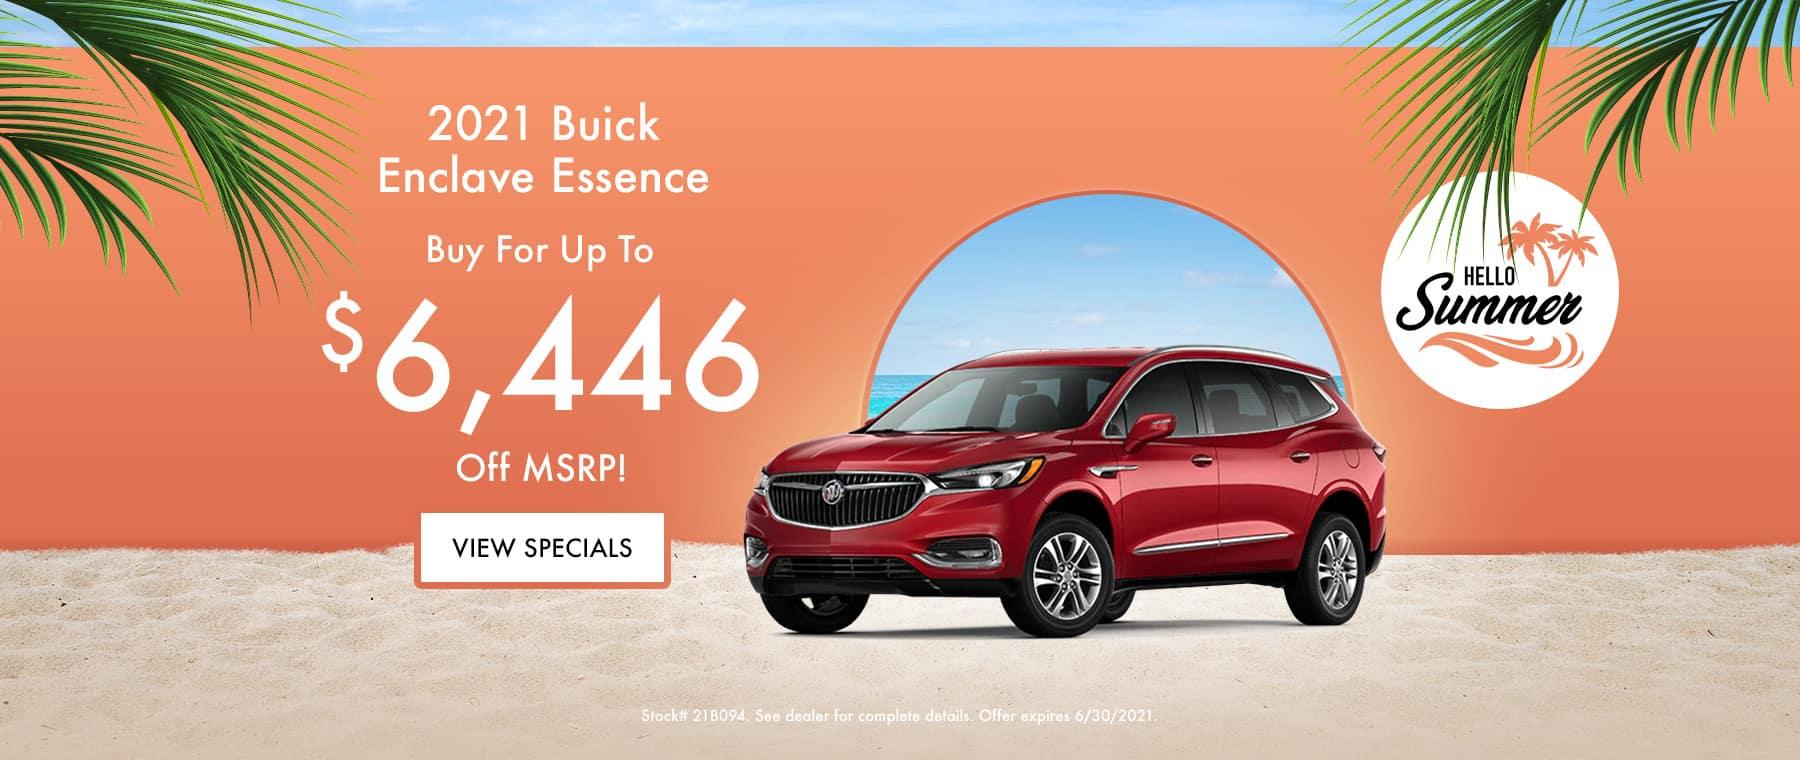 2021 Buick Enclave Essence June Special